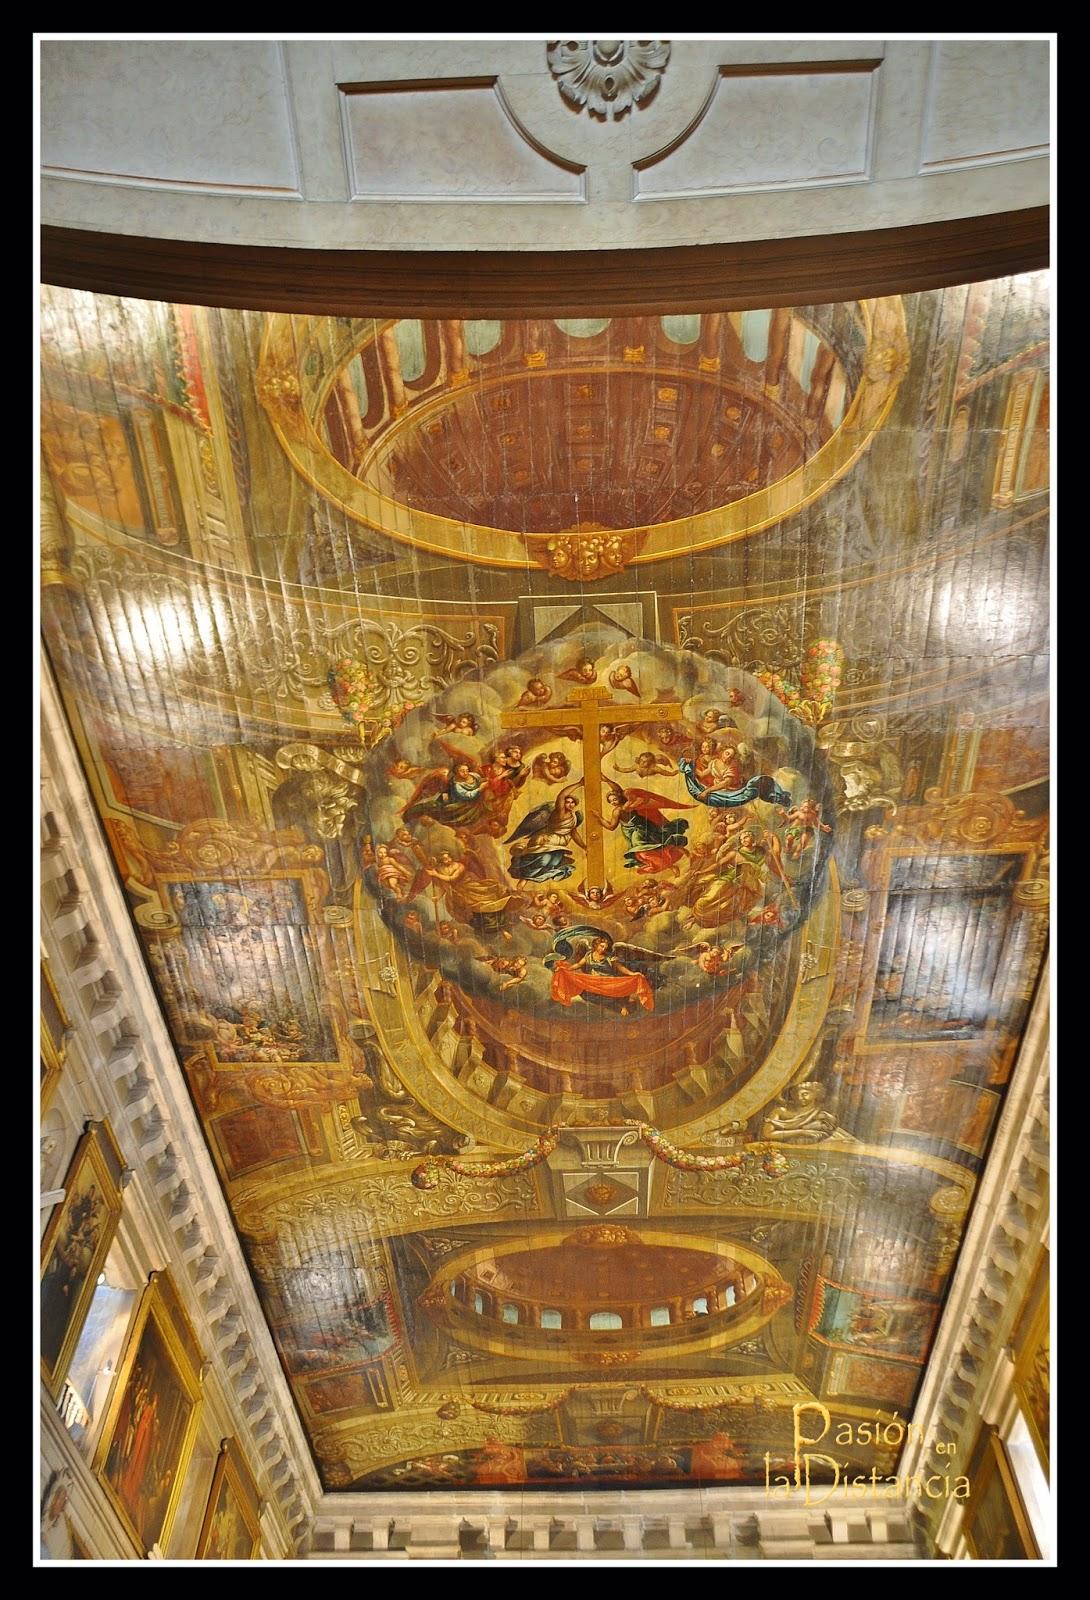 Cubierta pintada de la Iglesia de San Roque